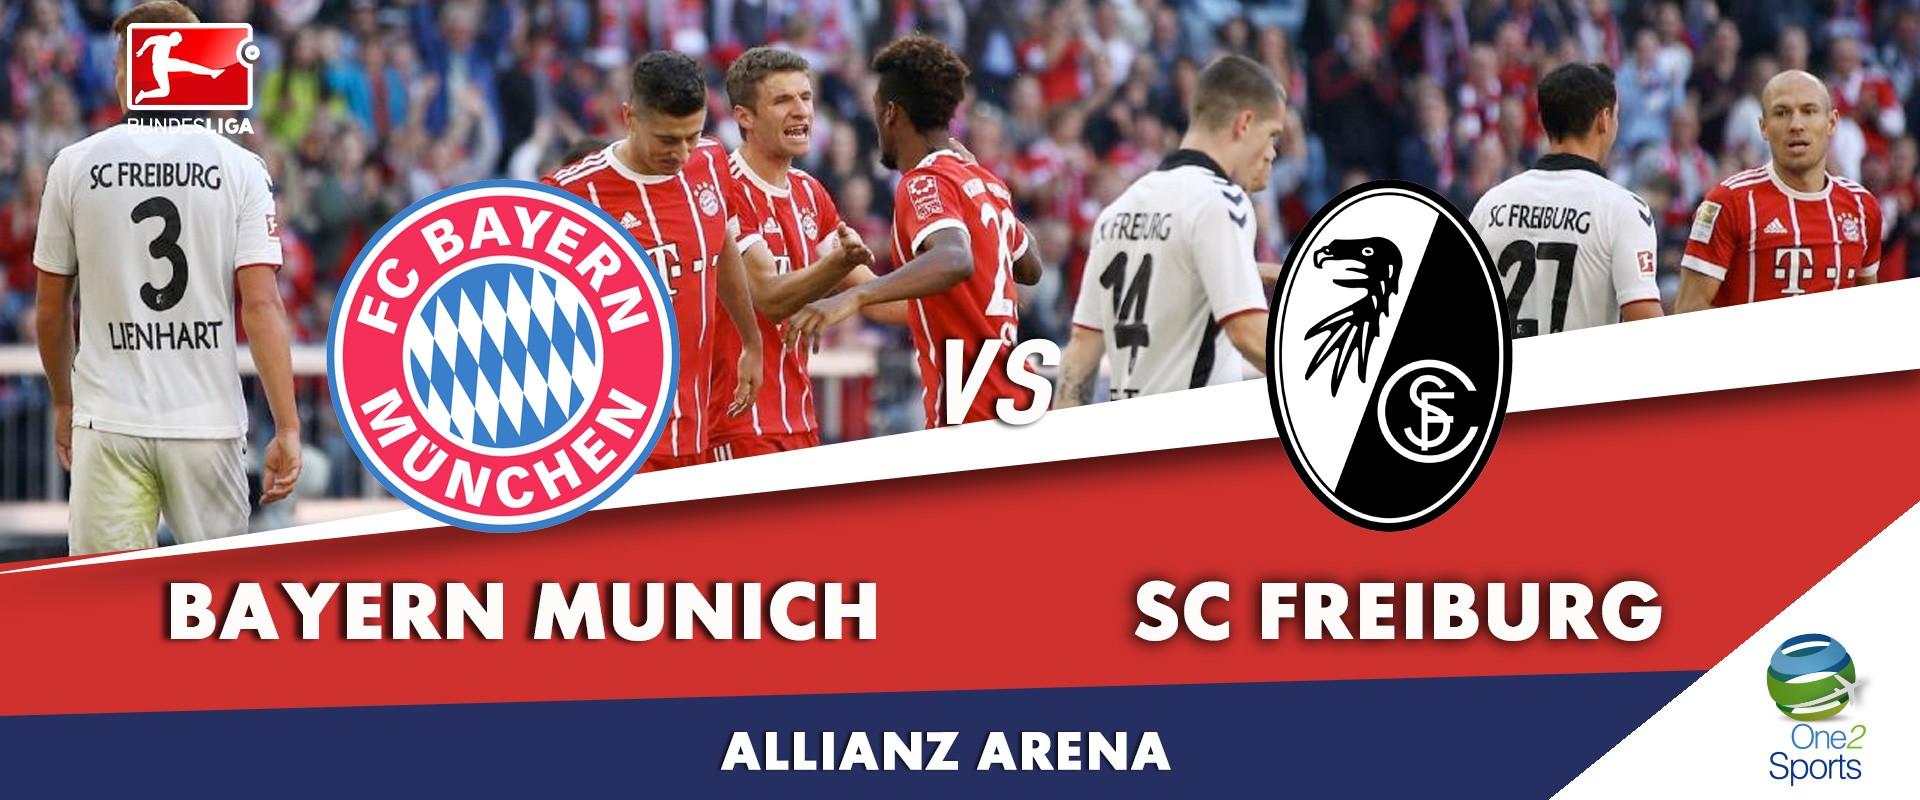 Bayern Munich vs Freiburg